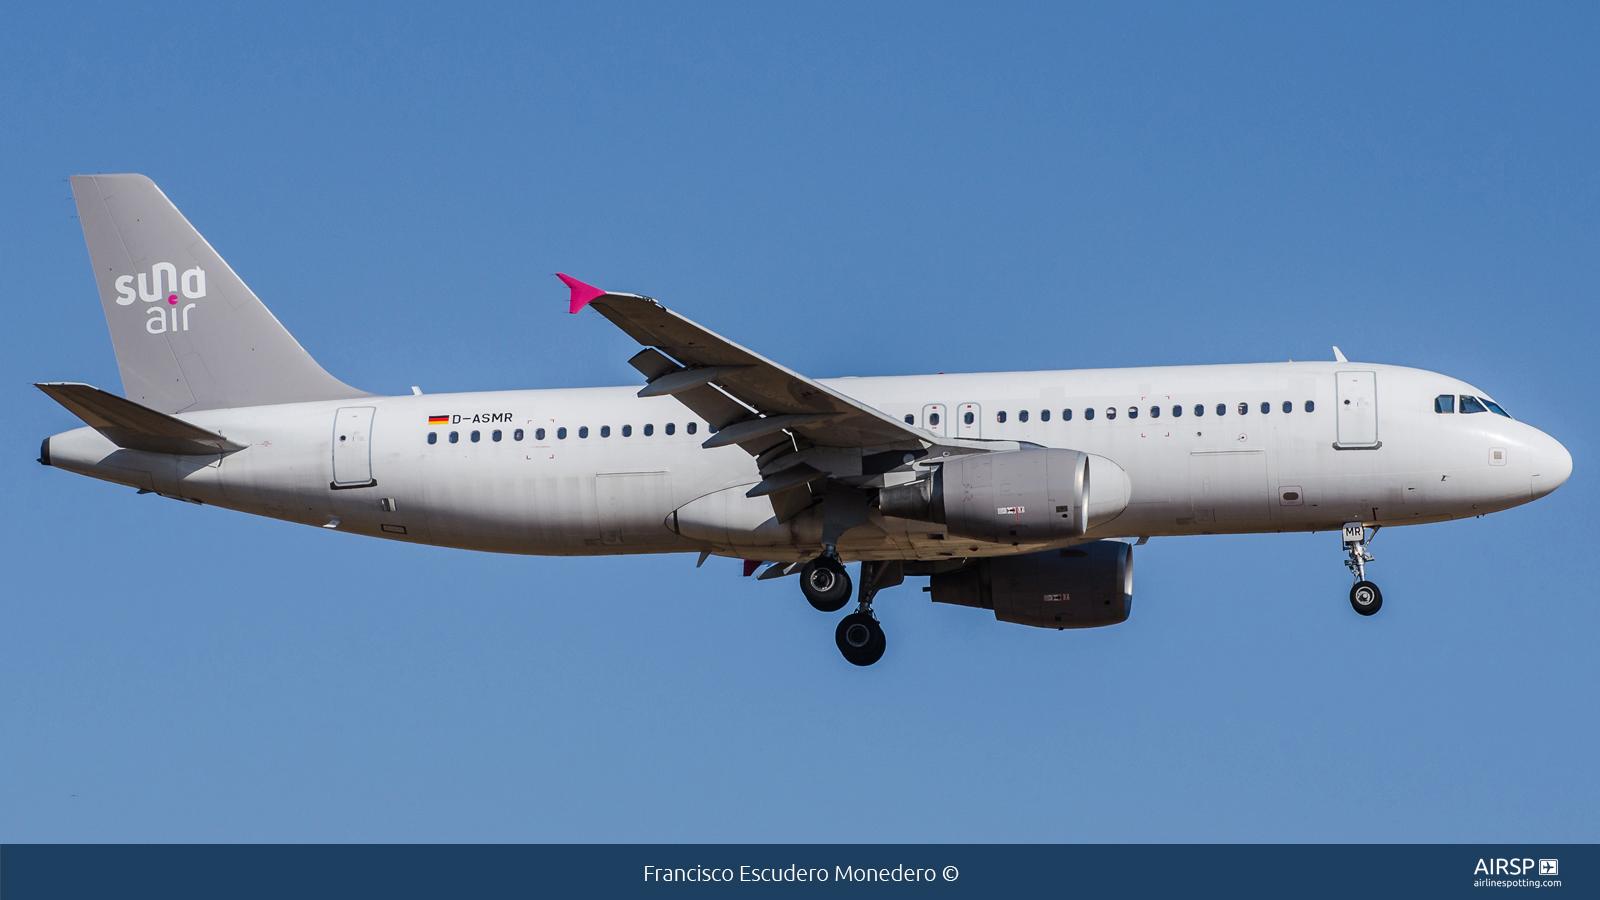 Sundair  Airbus A320  D-ASMR